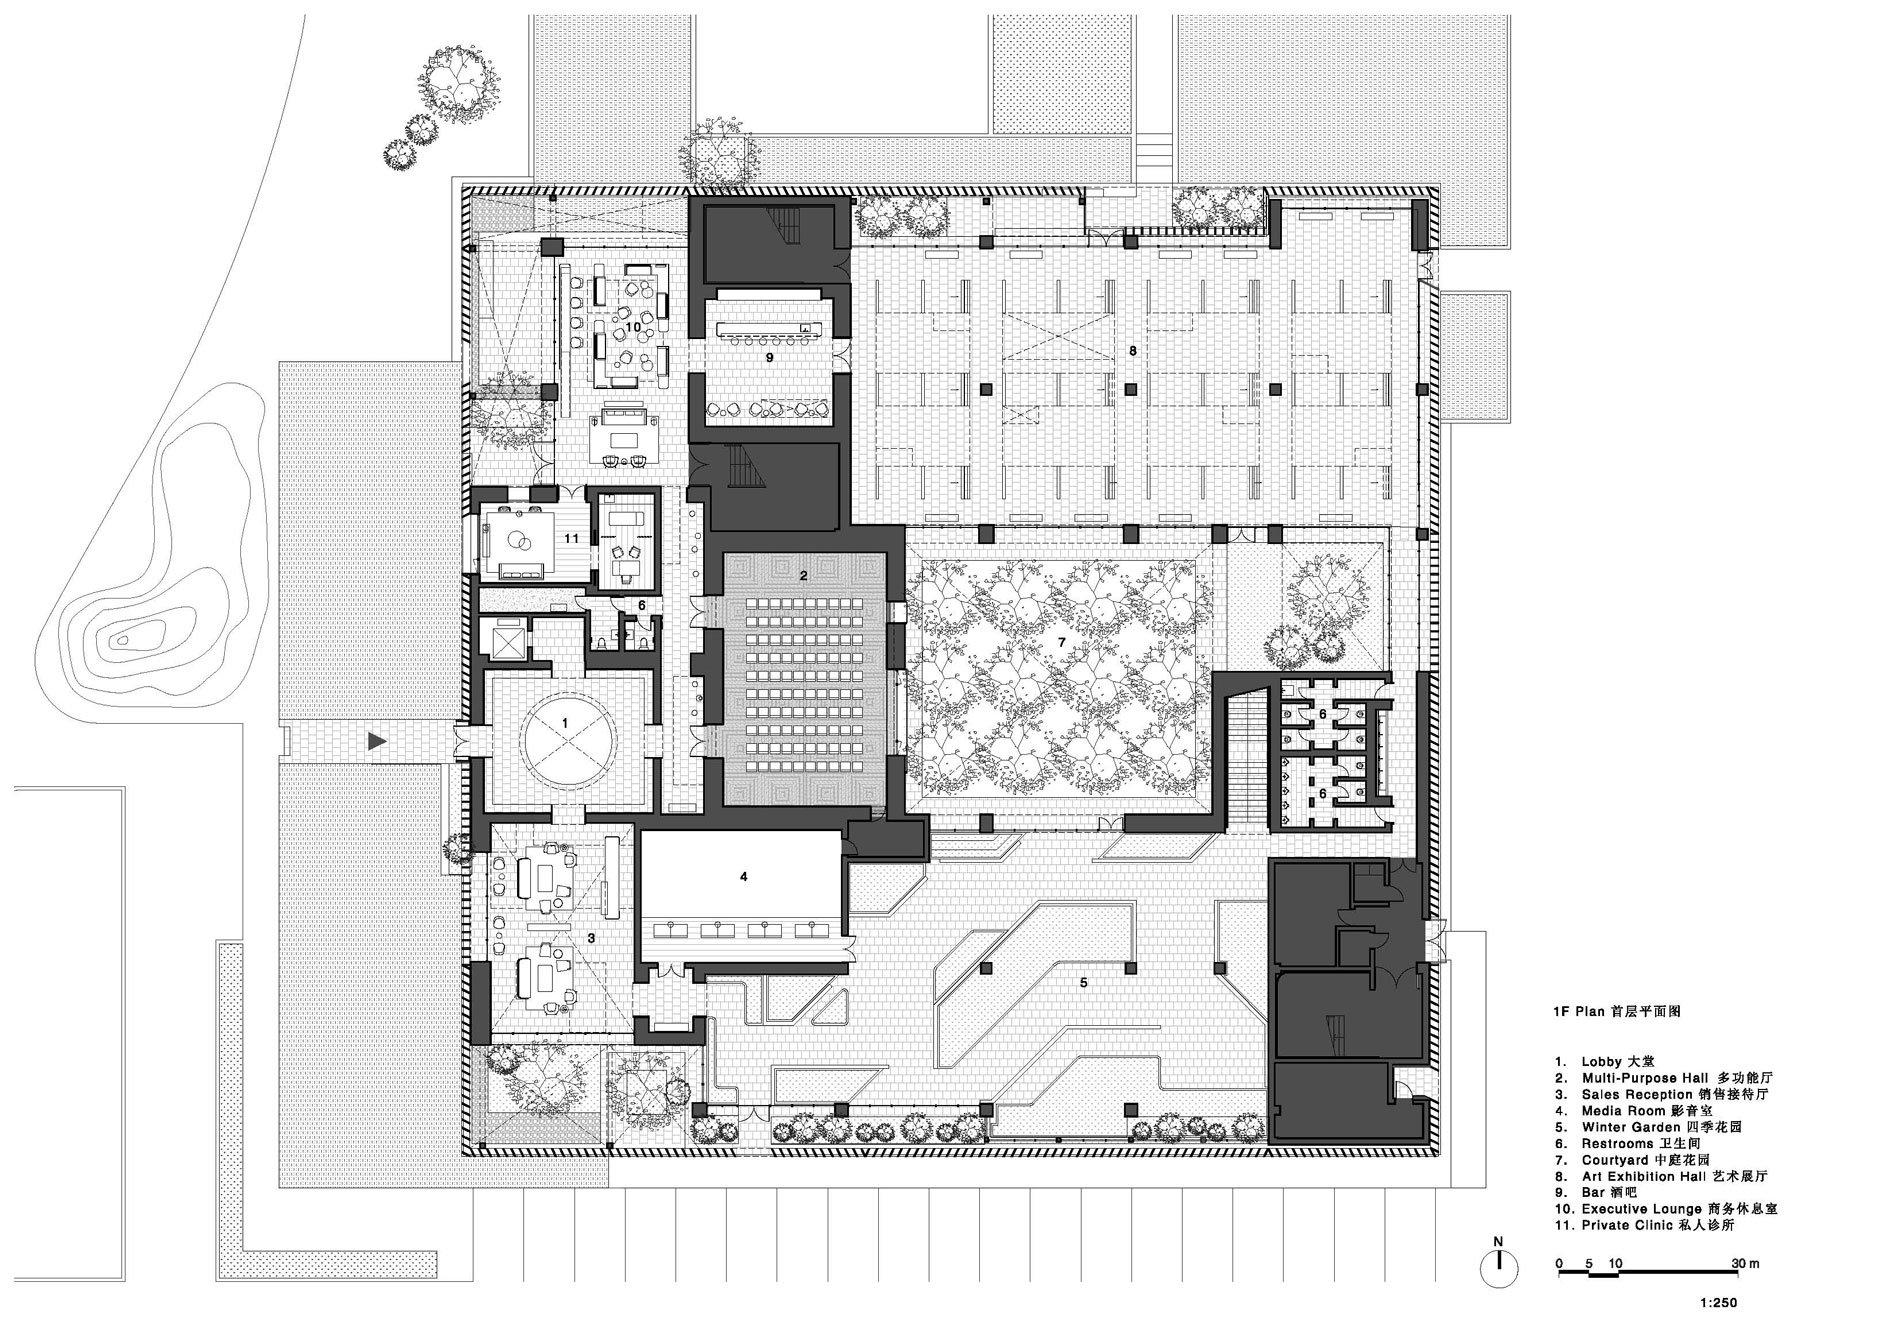 Junshan Cultural Center Drawings Neri&Hu Design and Research Office}